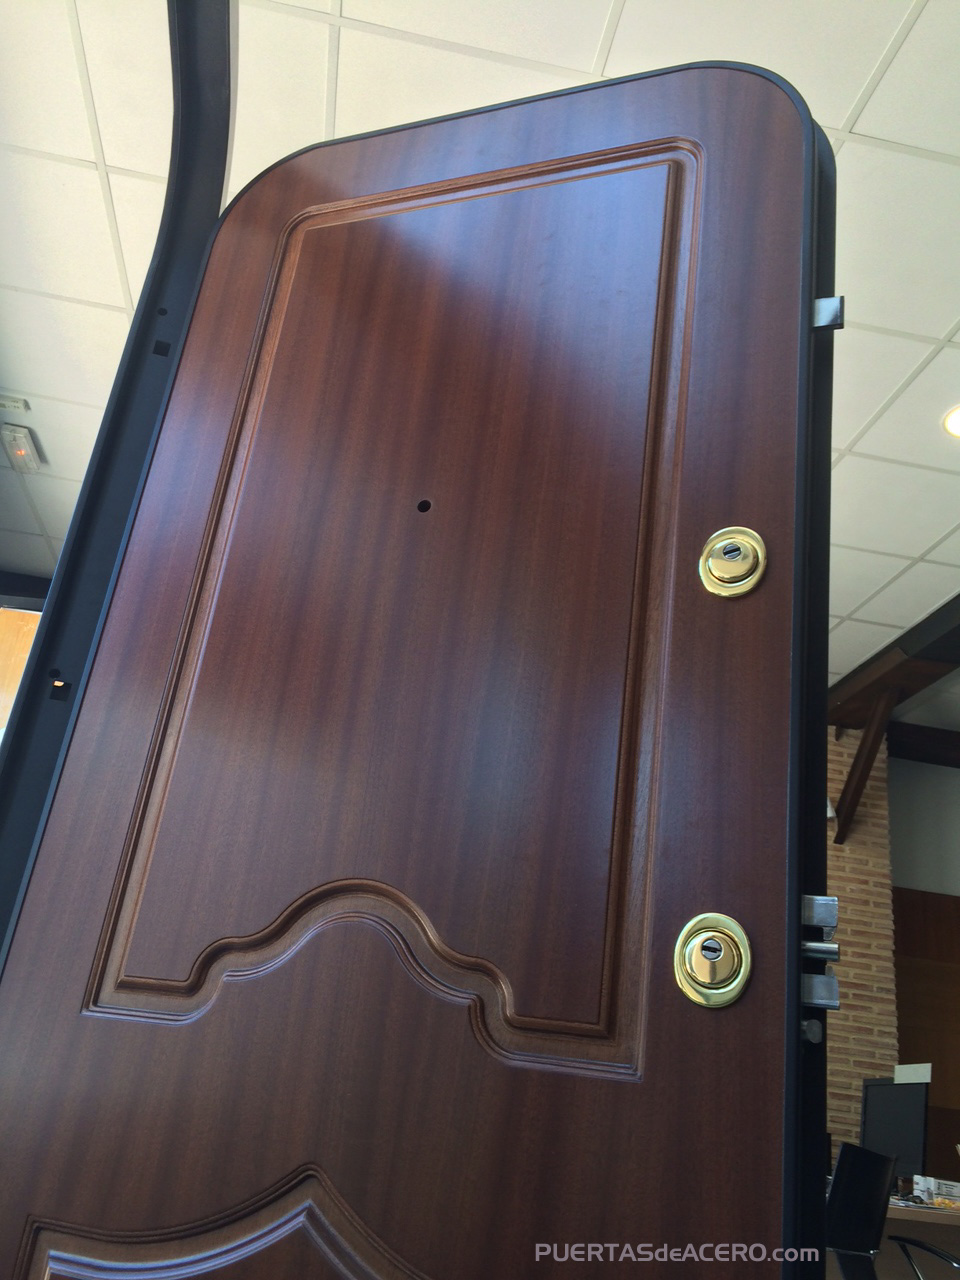 puerta con doble curva o doble punto, medio punto